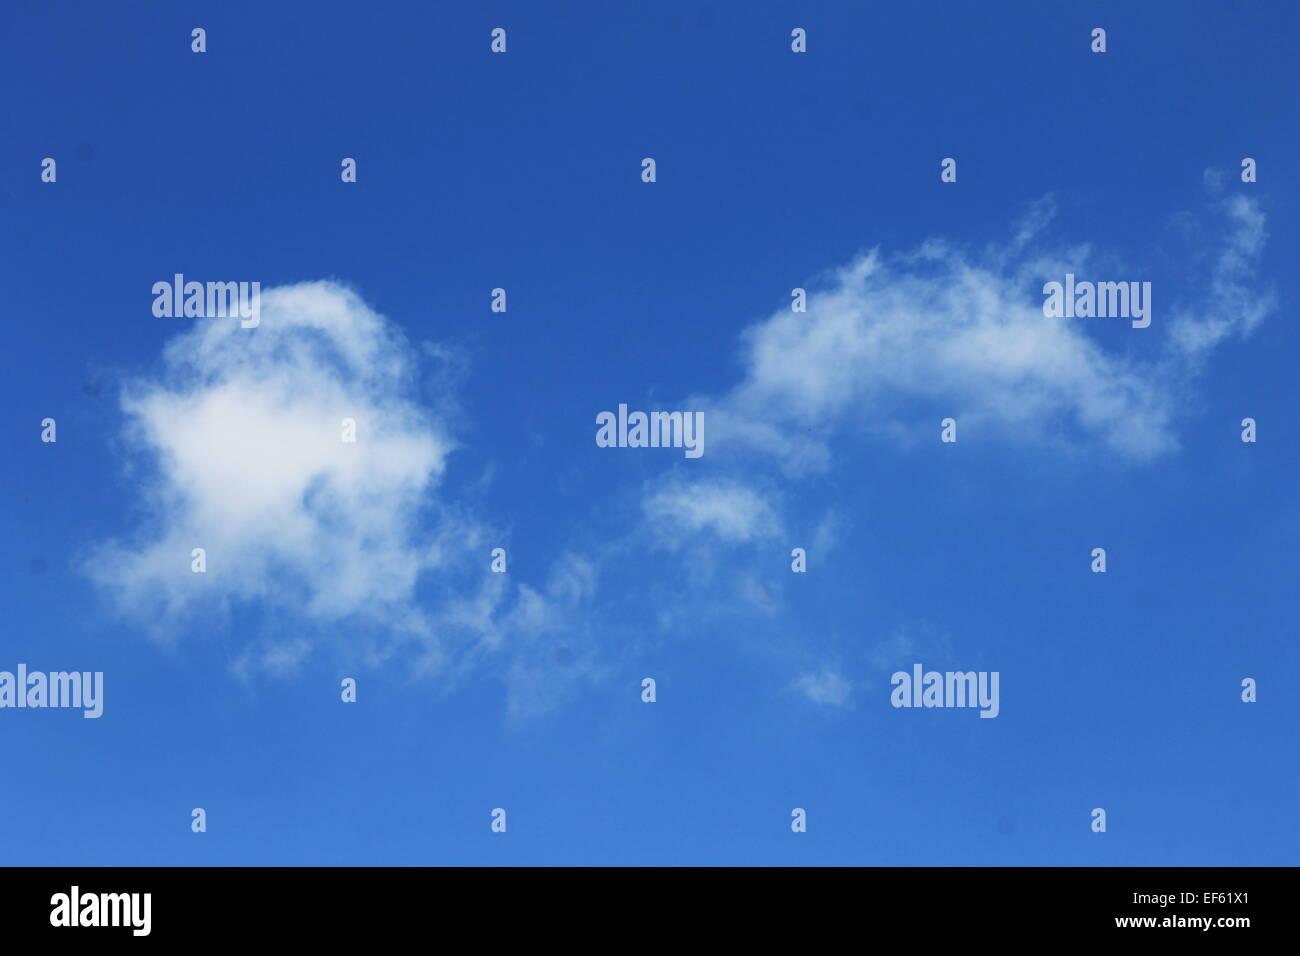 A single white cloud on a clear blue sky - Stock Image